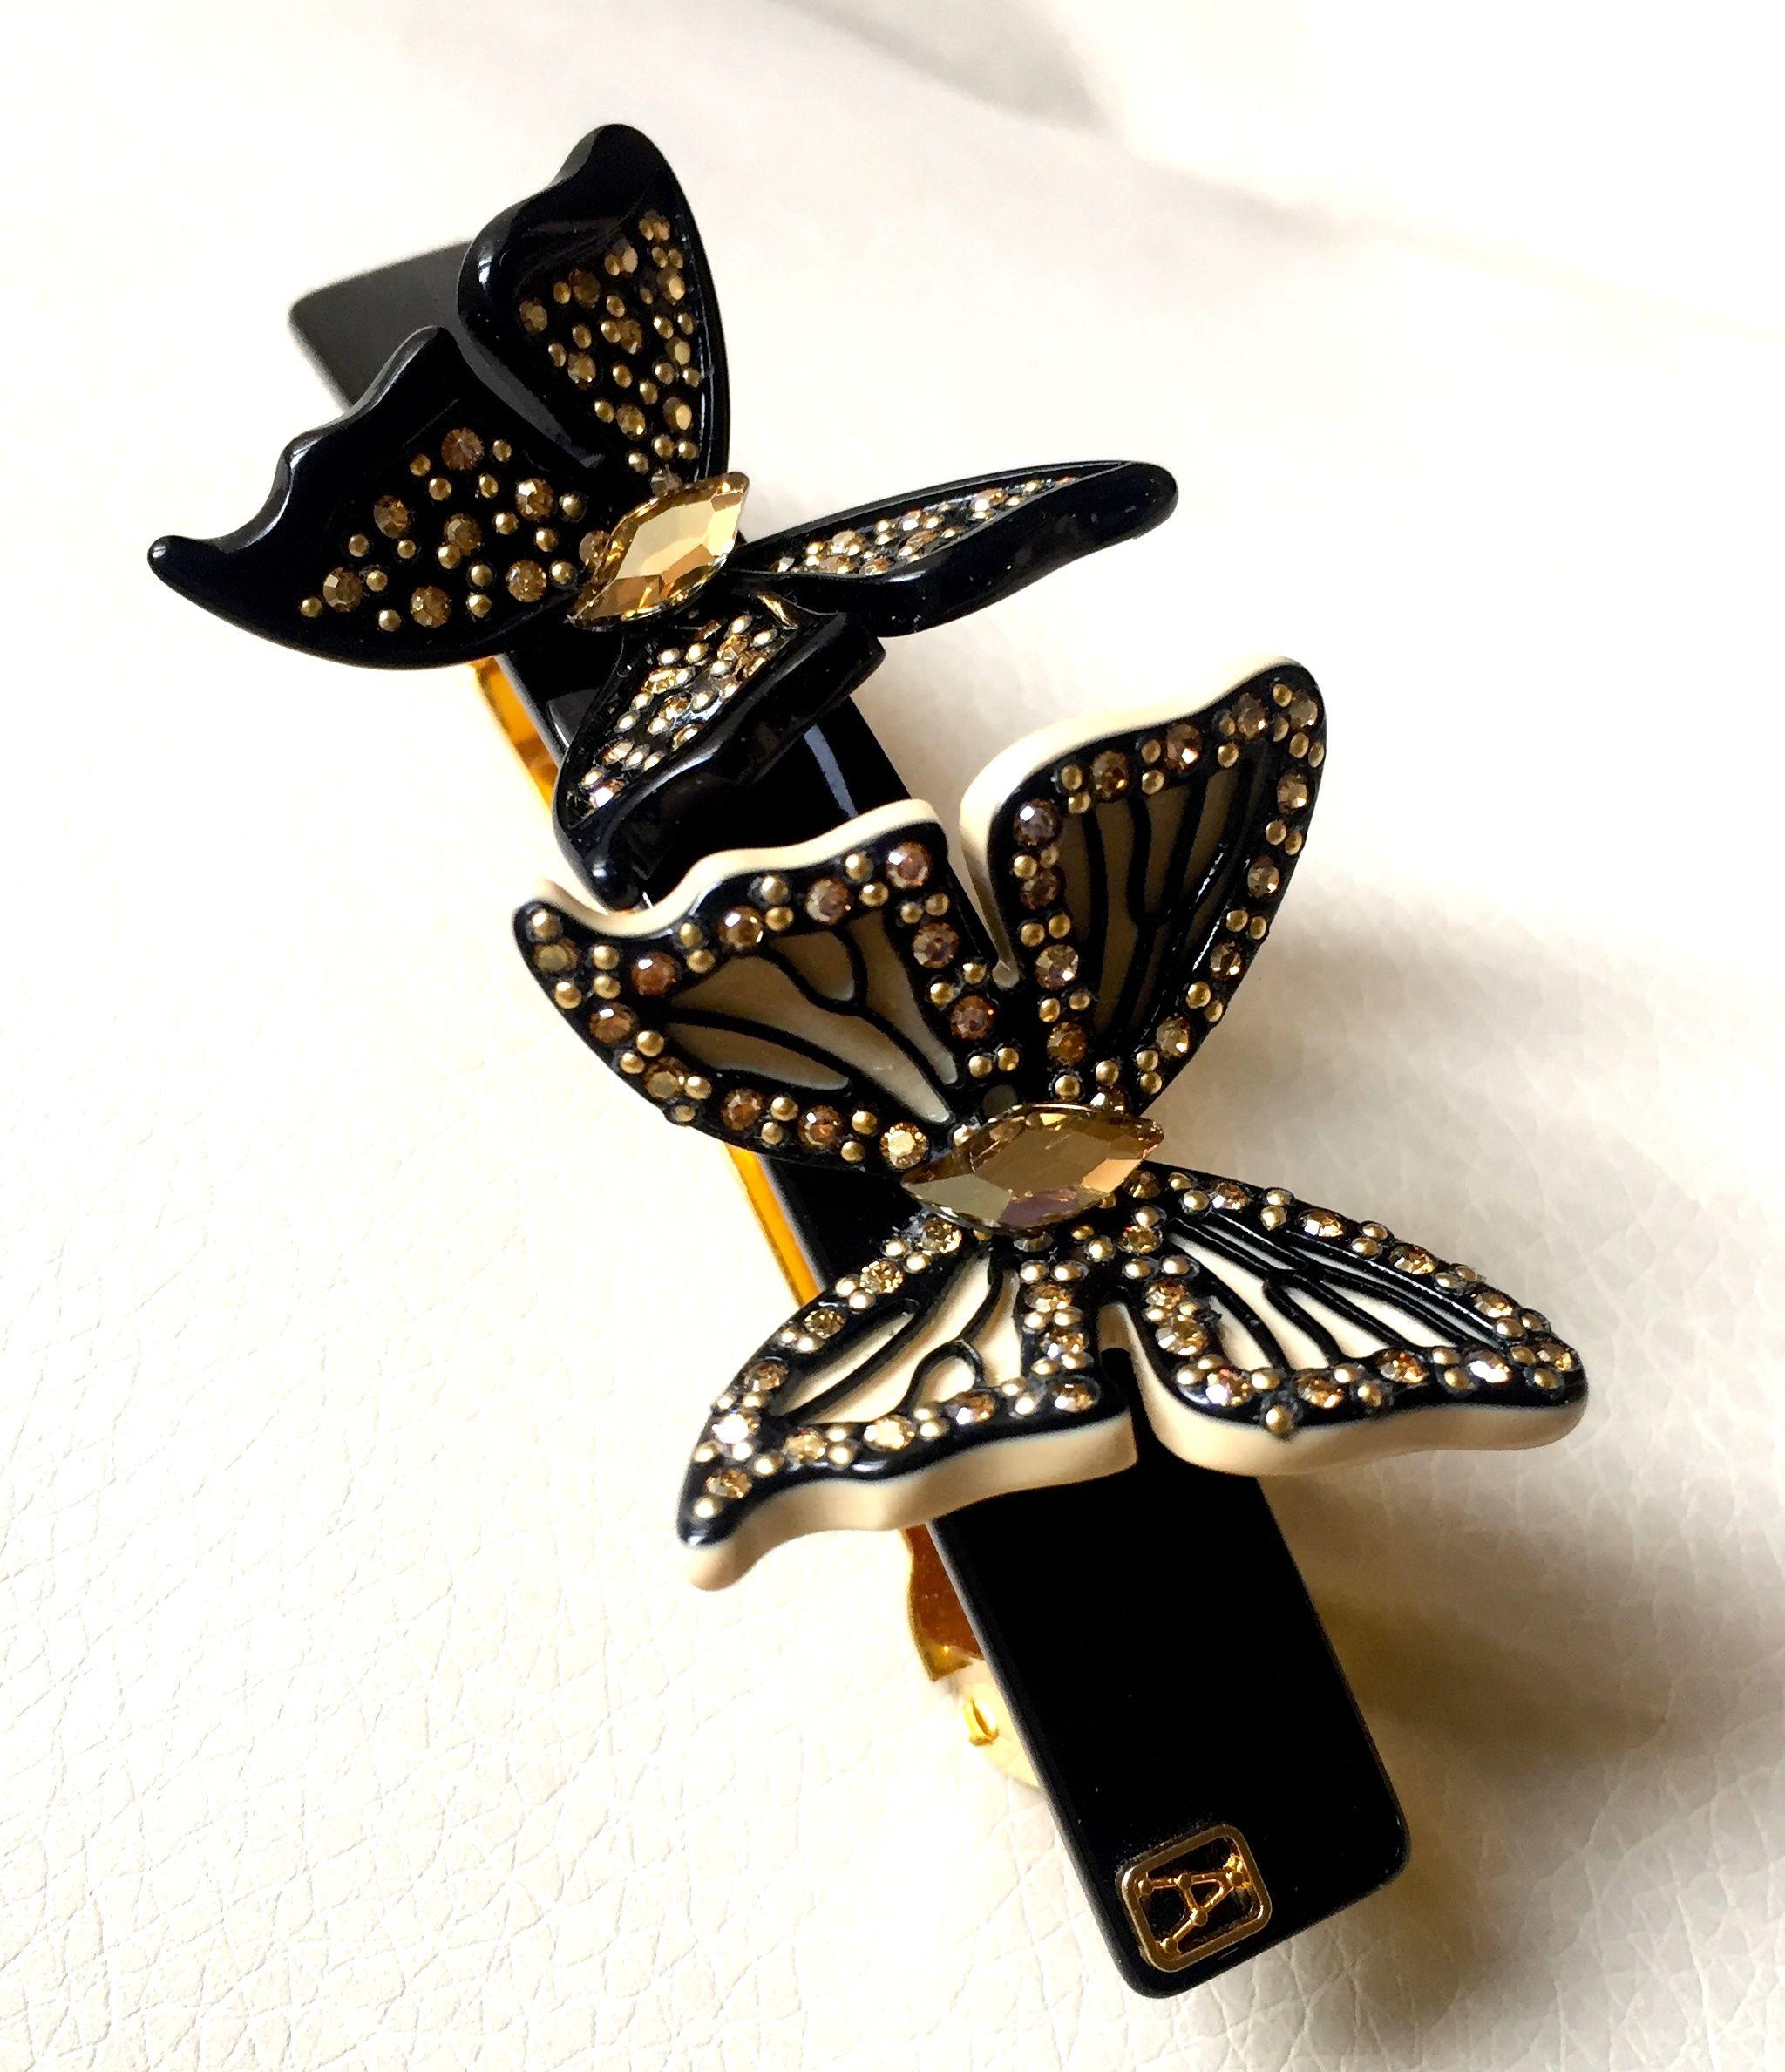 Alexandre de Paris(アレクサンドル ドゥ パリ)チョウチョ シリーズ   バレッタ ダブルチョウチョ 黒系